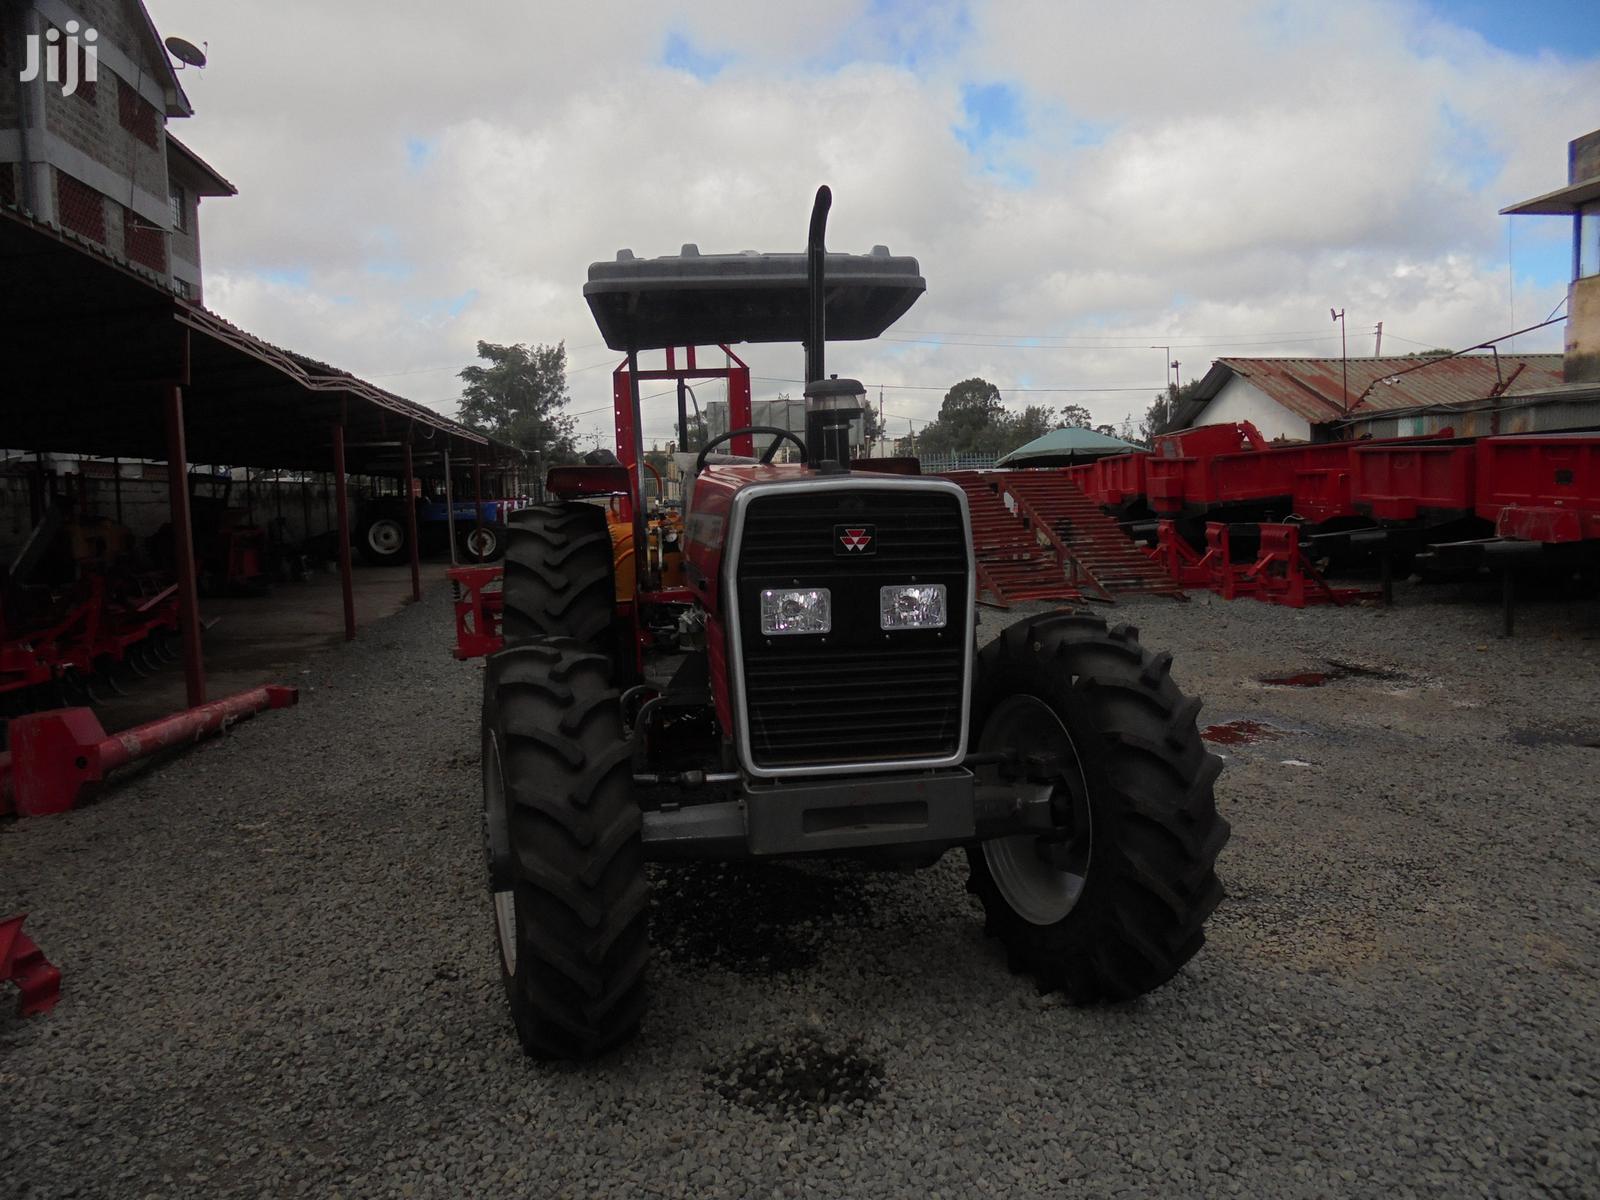 4 Wheel Drive Tractor Mf 385 | Heavy Equipment for sale in Woodley/Kenyatta Golf Course, Nairobi, Kenya